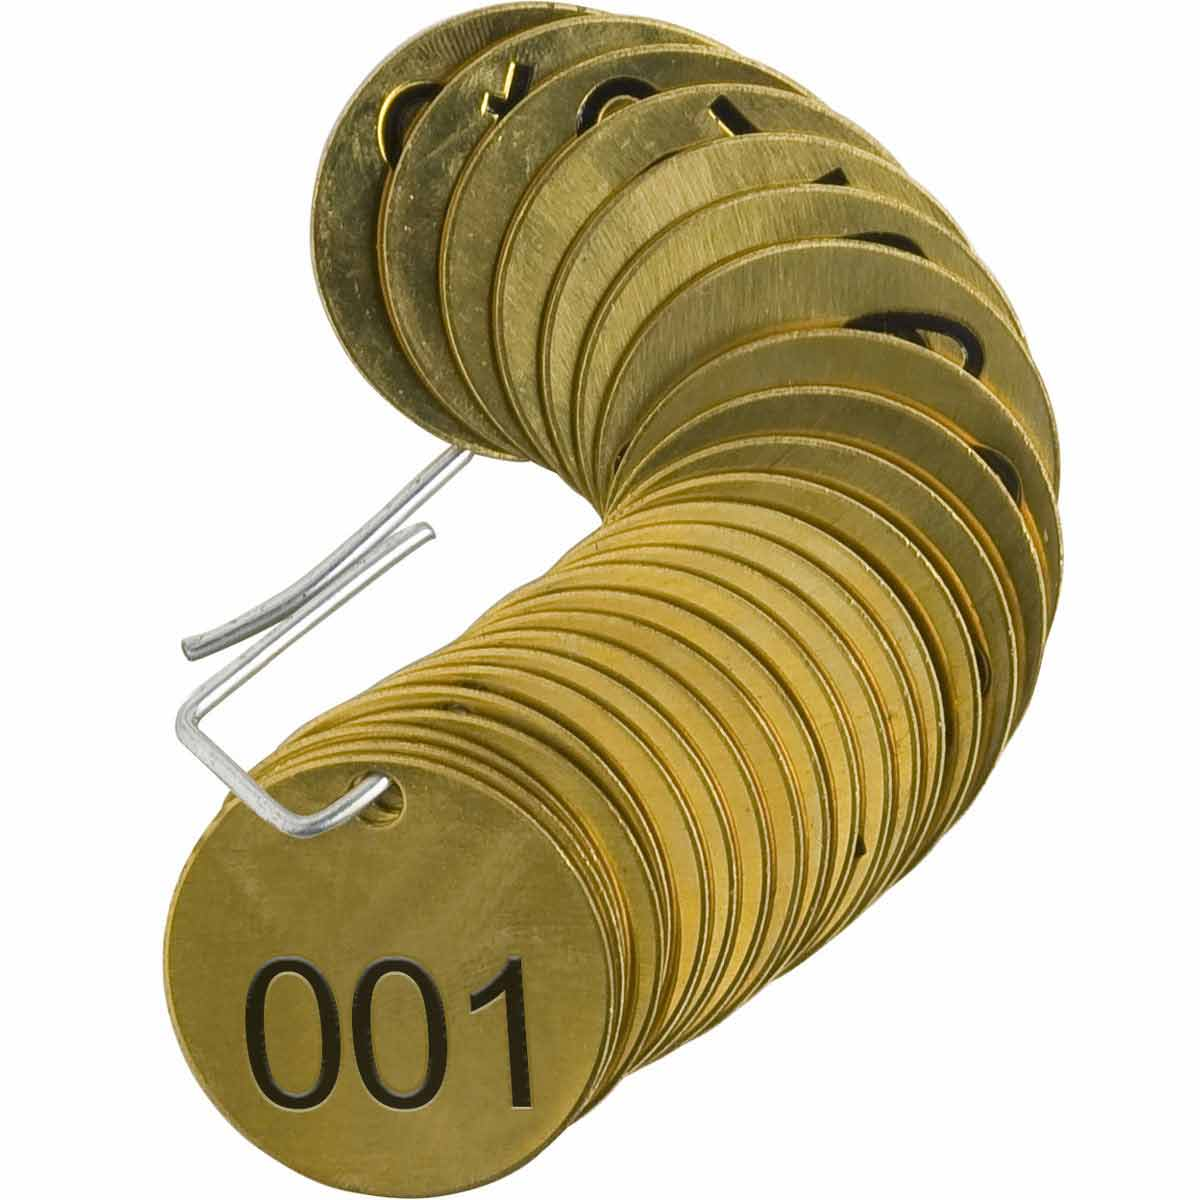 25 x Brass Identification Tags